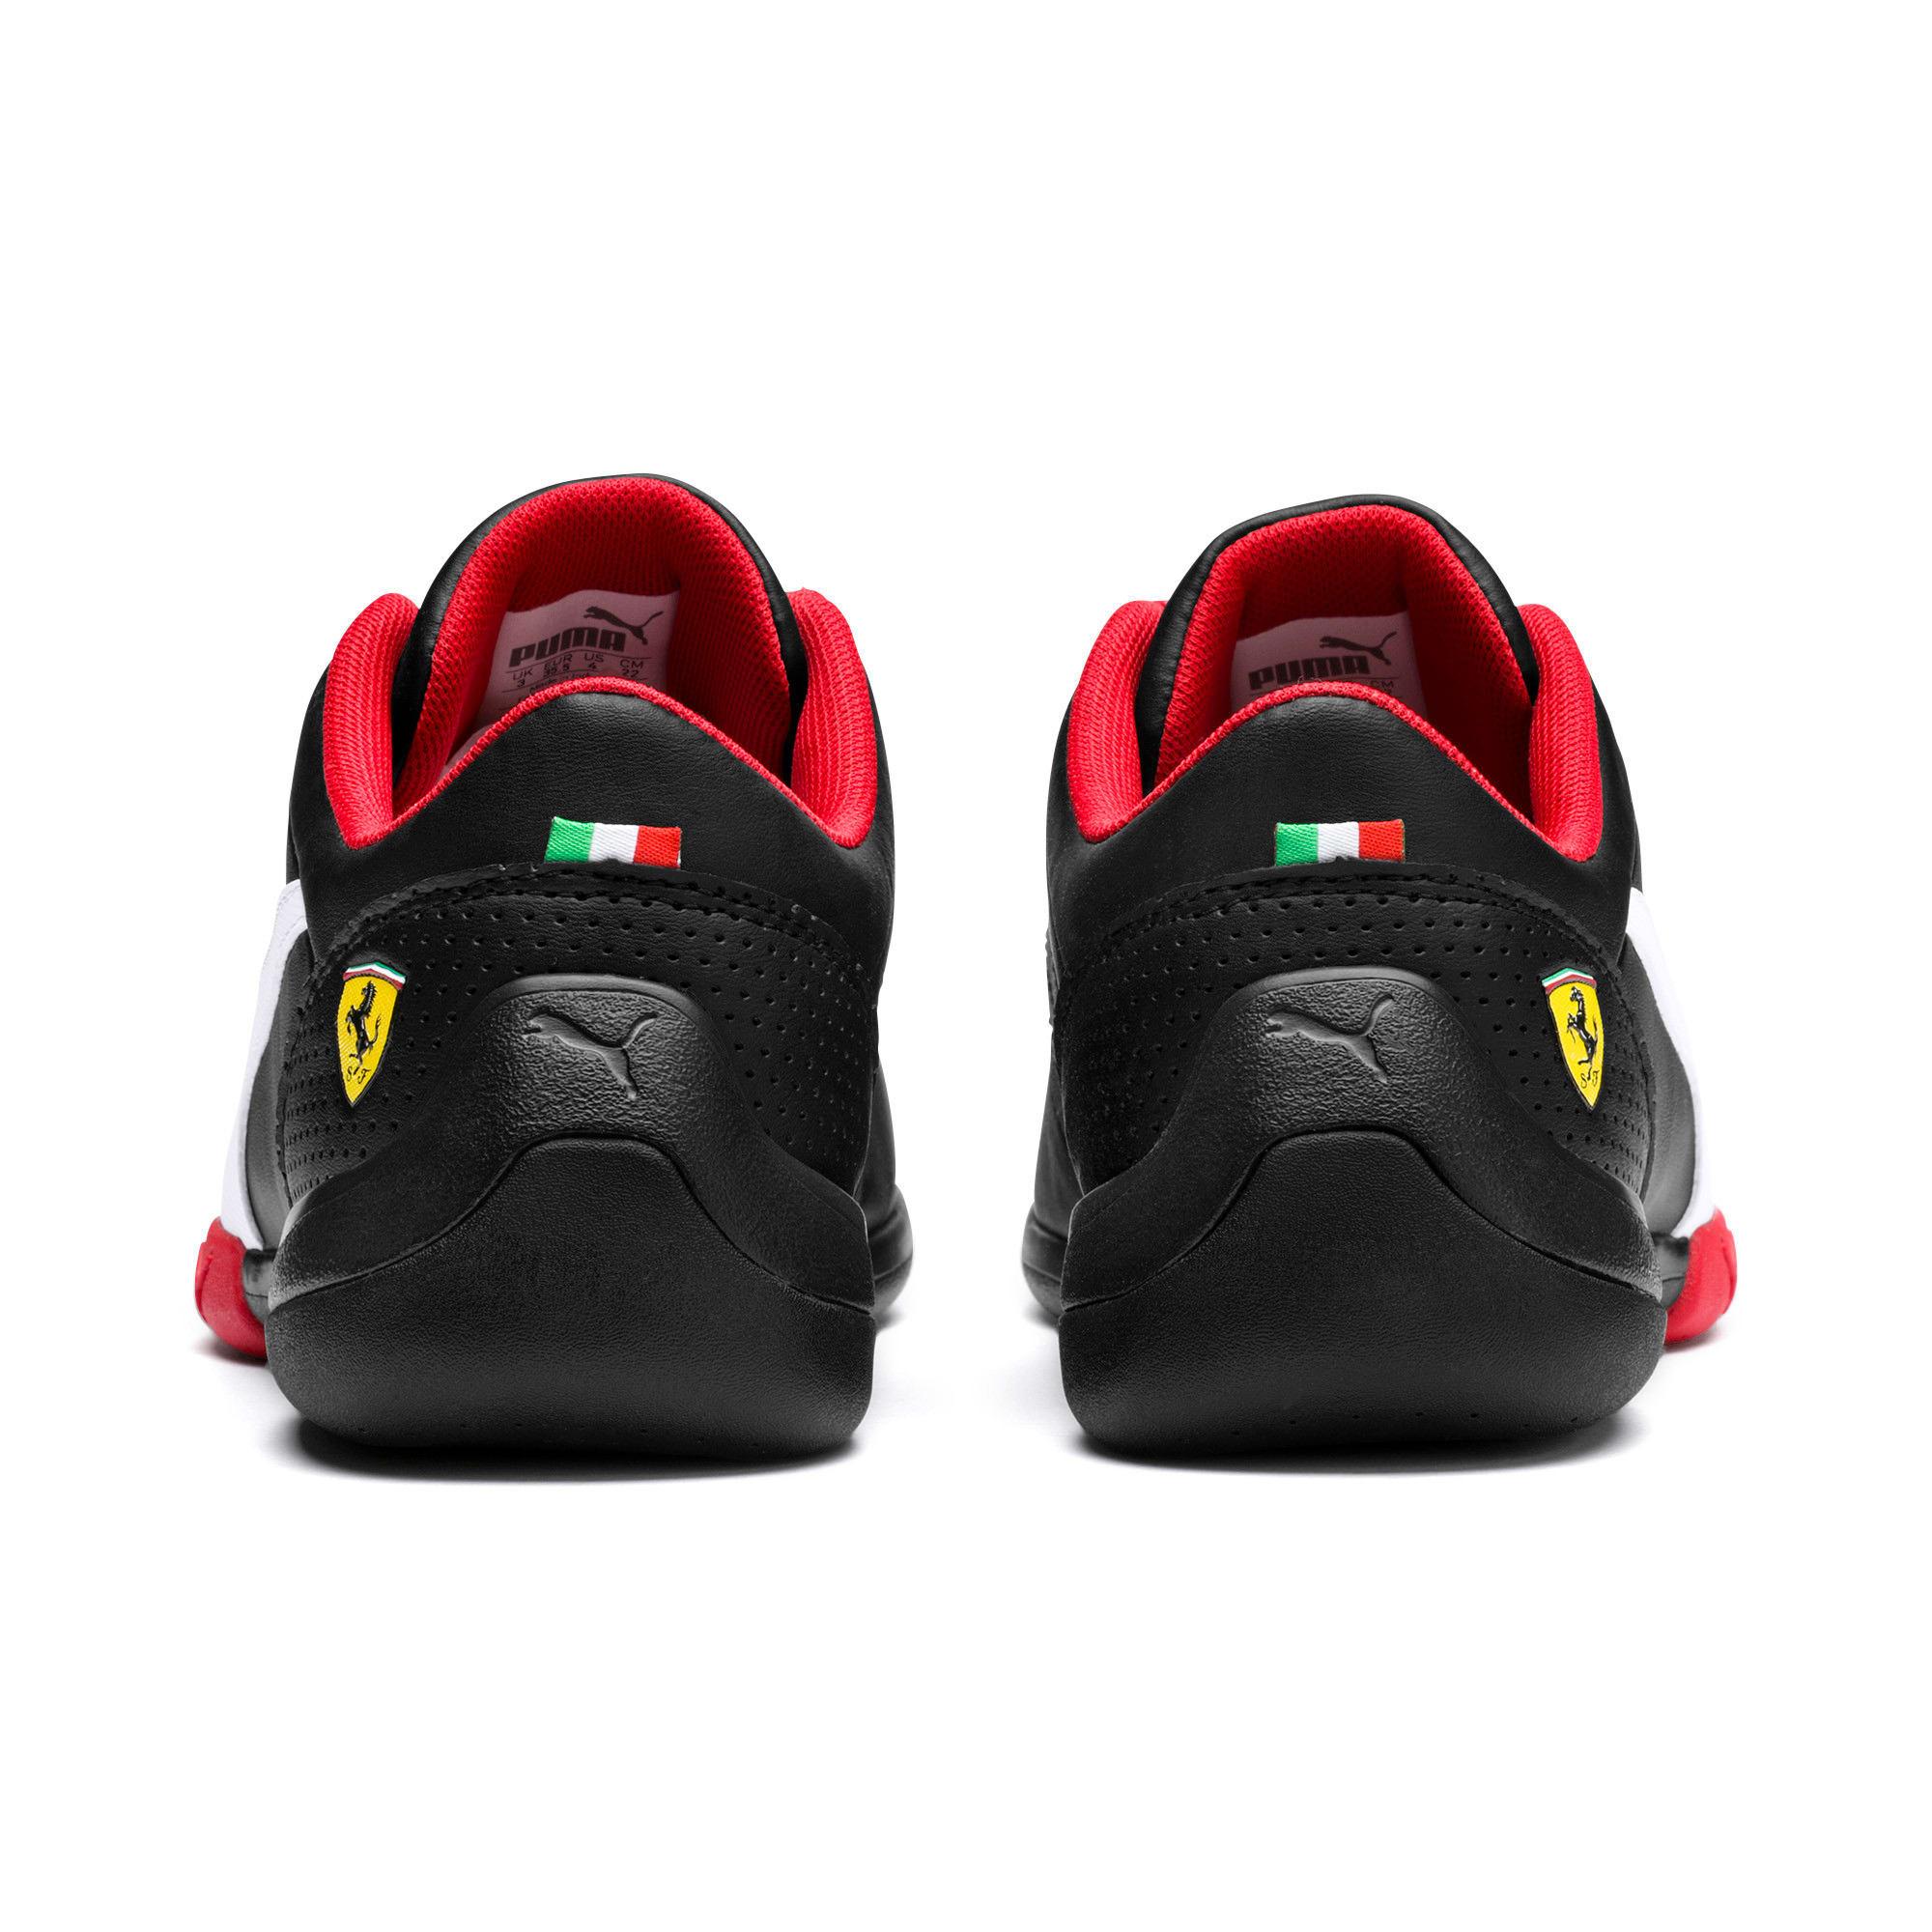 Thumbnail 3 of Ferrari Kart Cat III Youth Trainers, Puma Black-Puma White, medium-IND